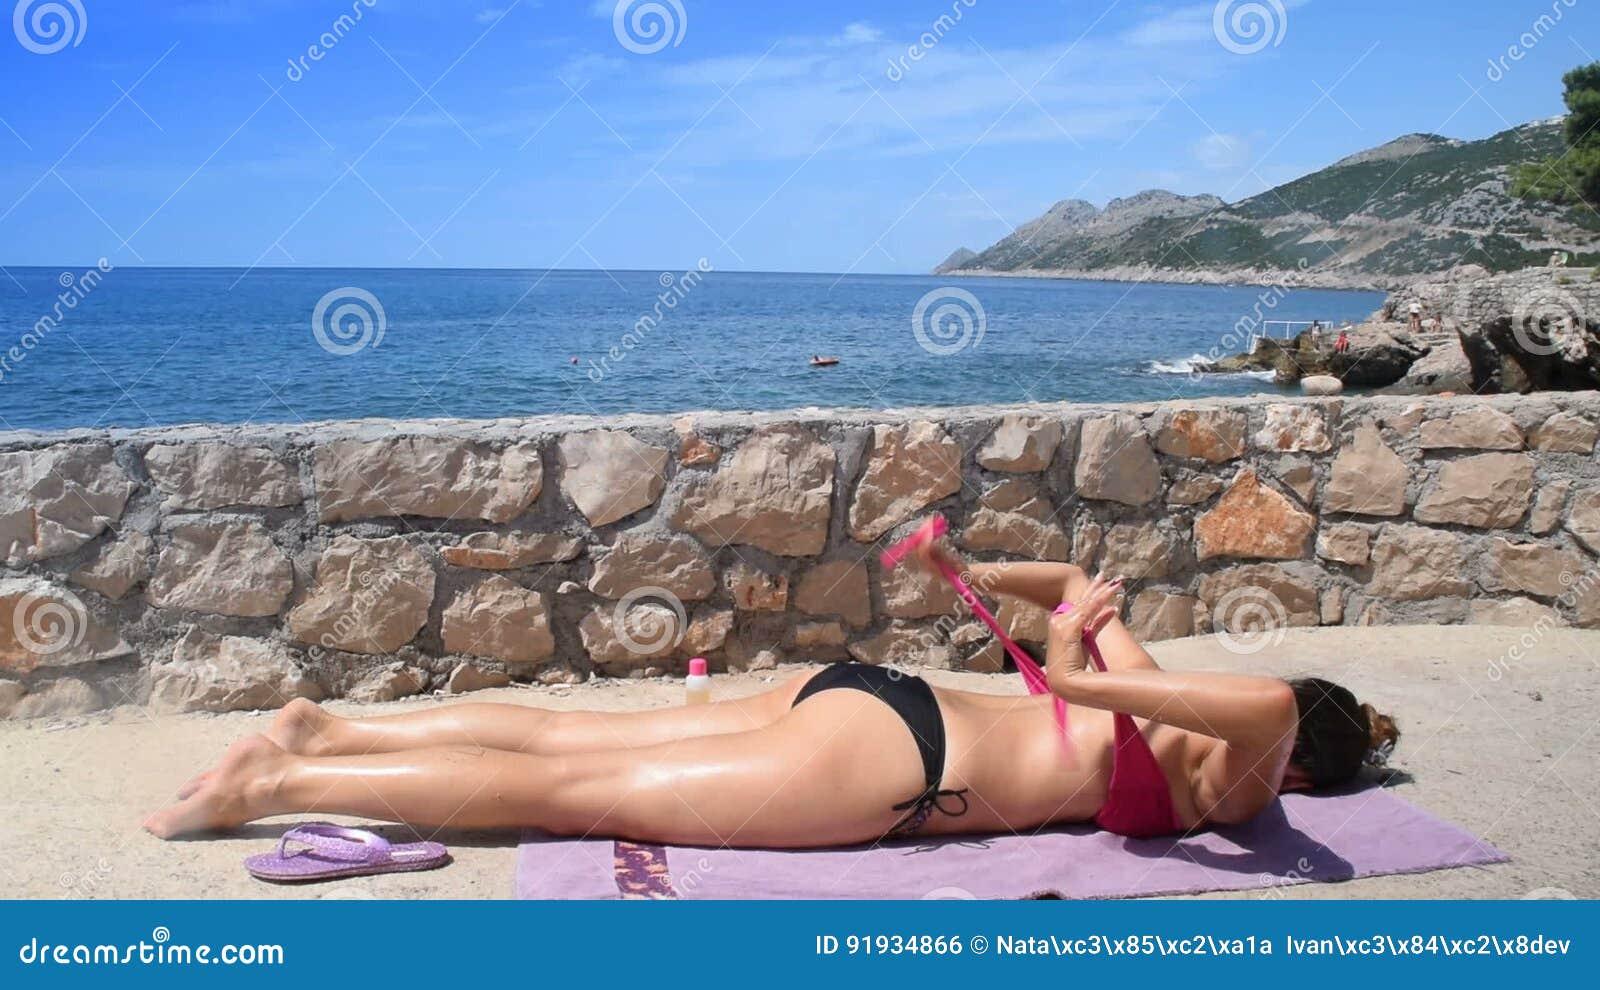 Young teen girls sunbathing